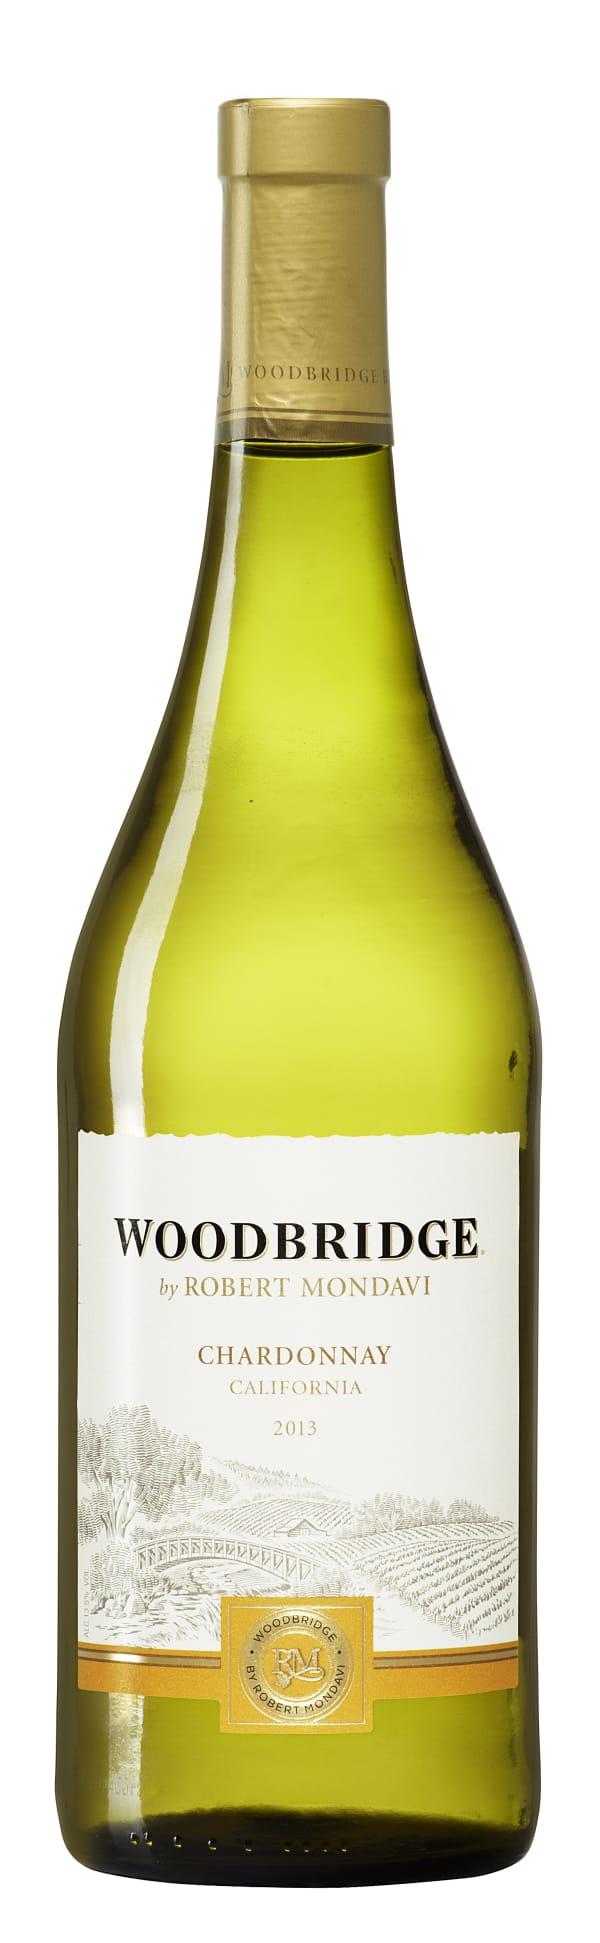 Robert Mondavi Woodbridge Chardonnay 2015